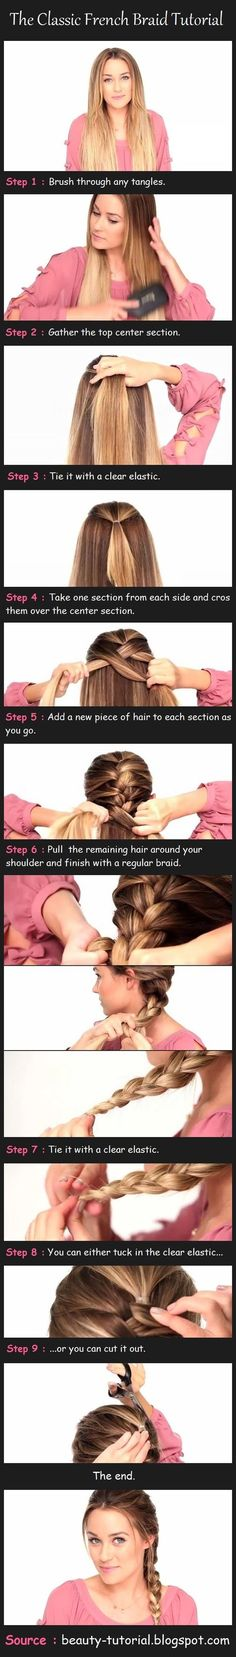 Step by step French braid